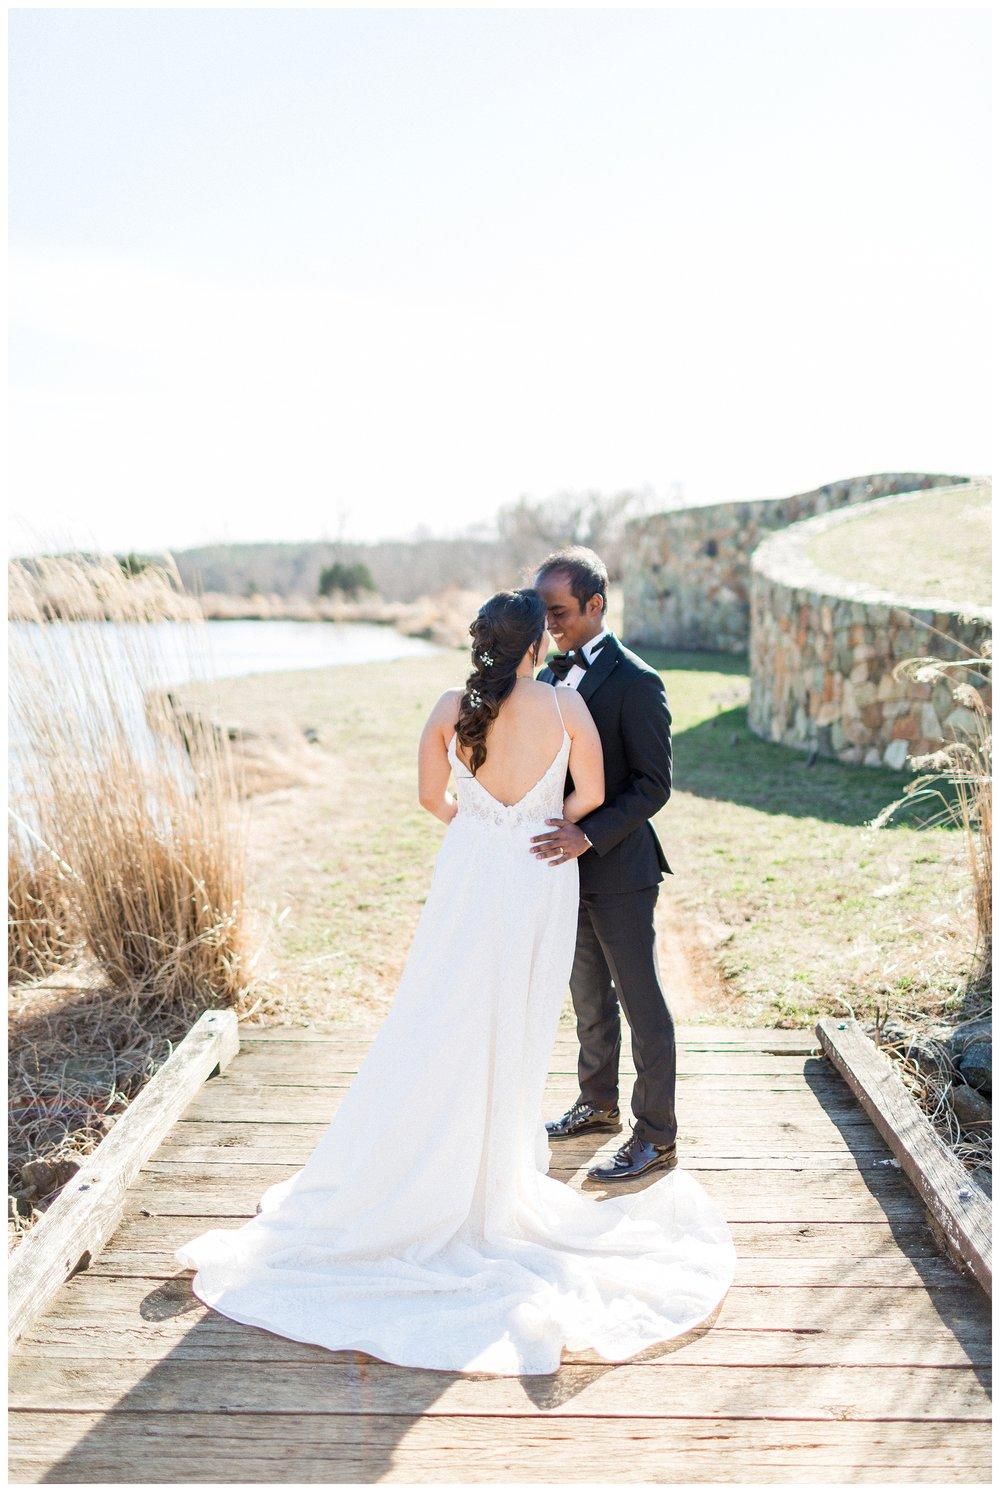 Stone Tower Winery Wedding | Virginia Winter Wedding | VA Wedding Photographer Kir Tuben_0052.jpg